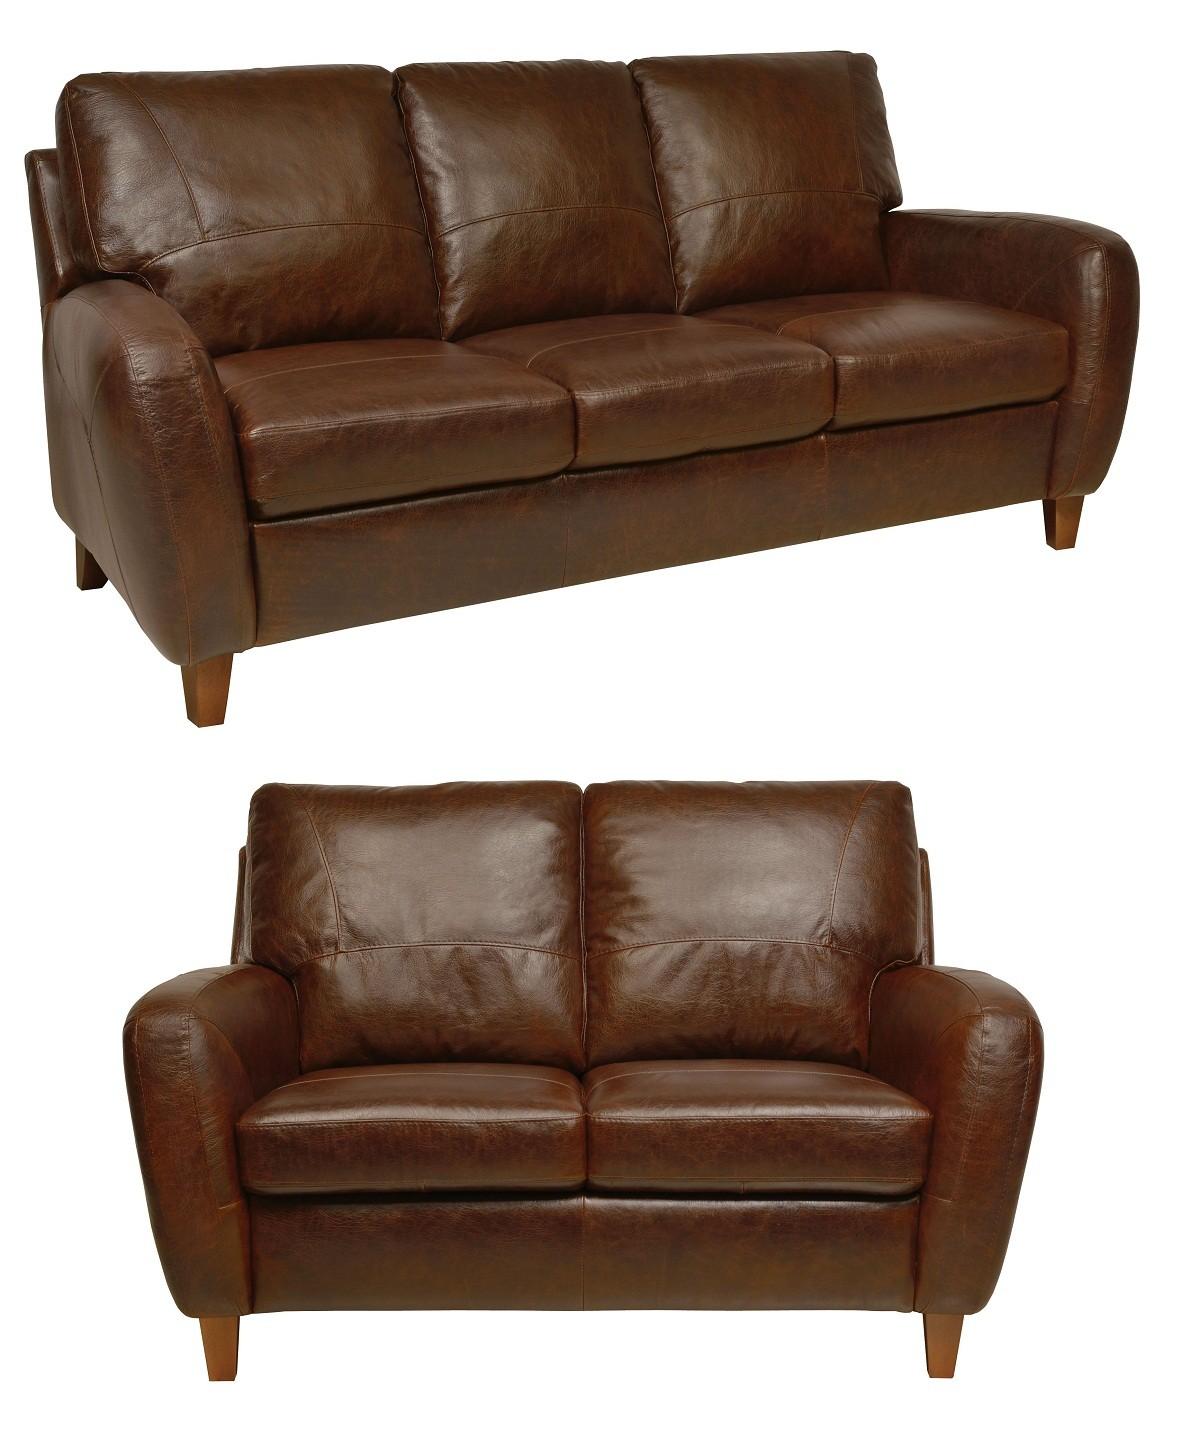 Italian Living Room Furniture Sets: Jennifer Antique Tan Italian Leather Living Room Set From